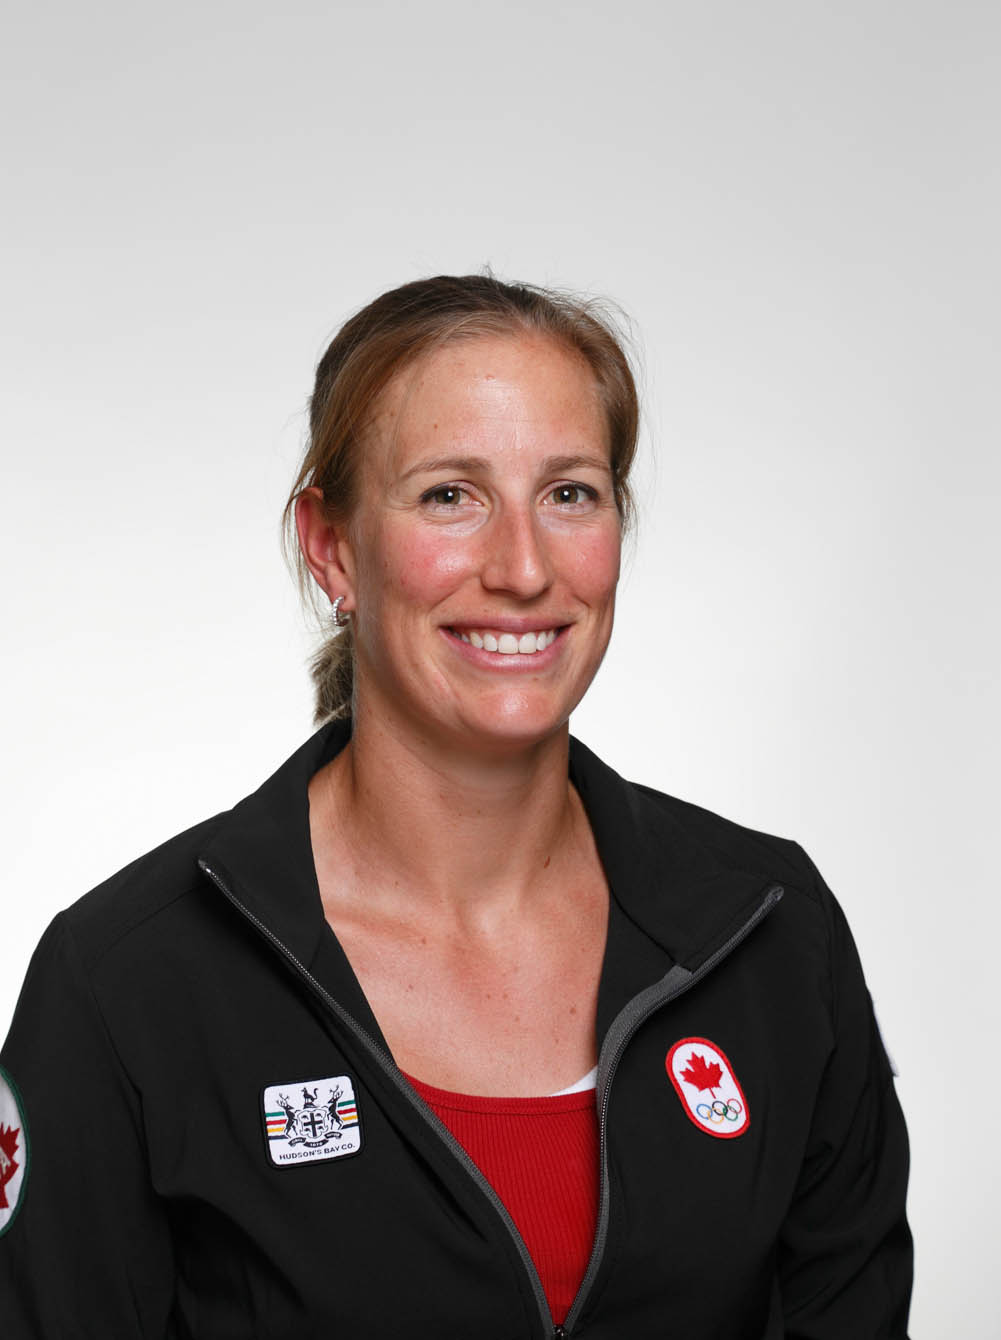 Janine Hanson